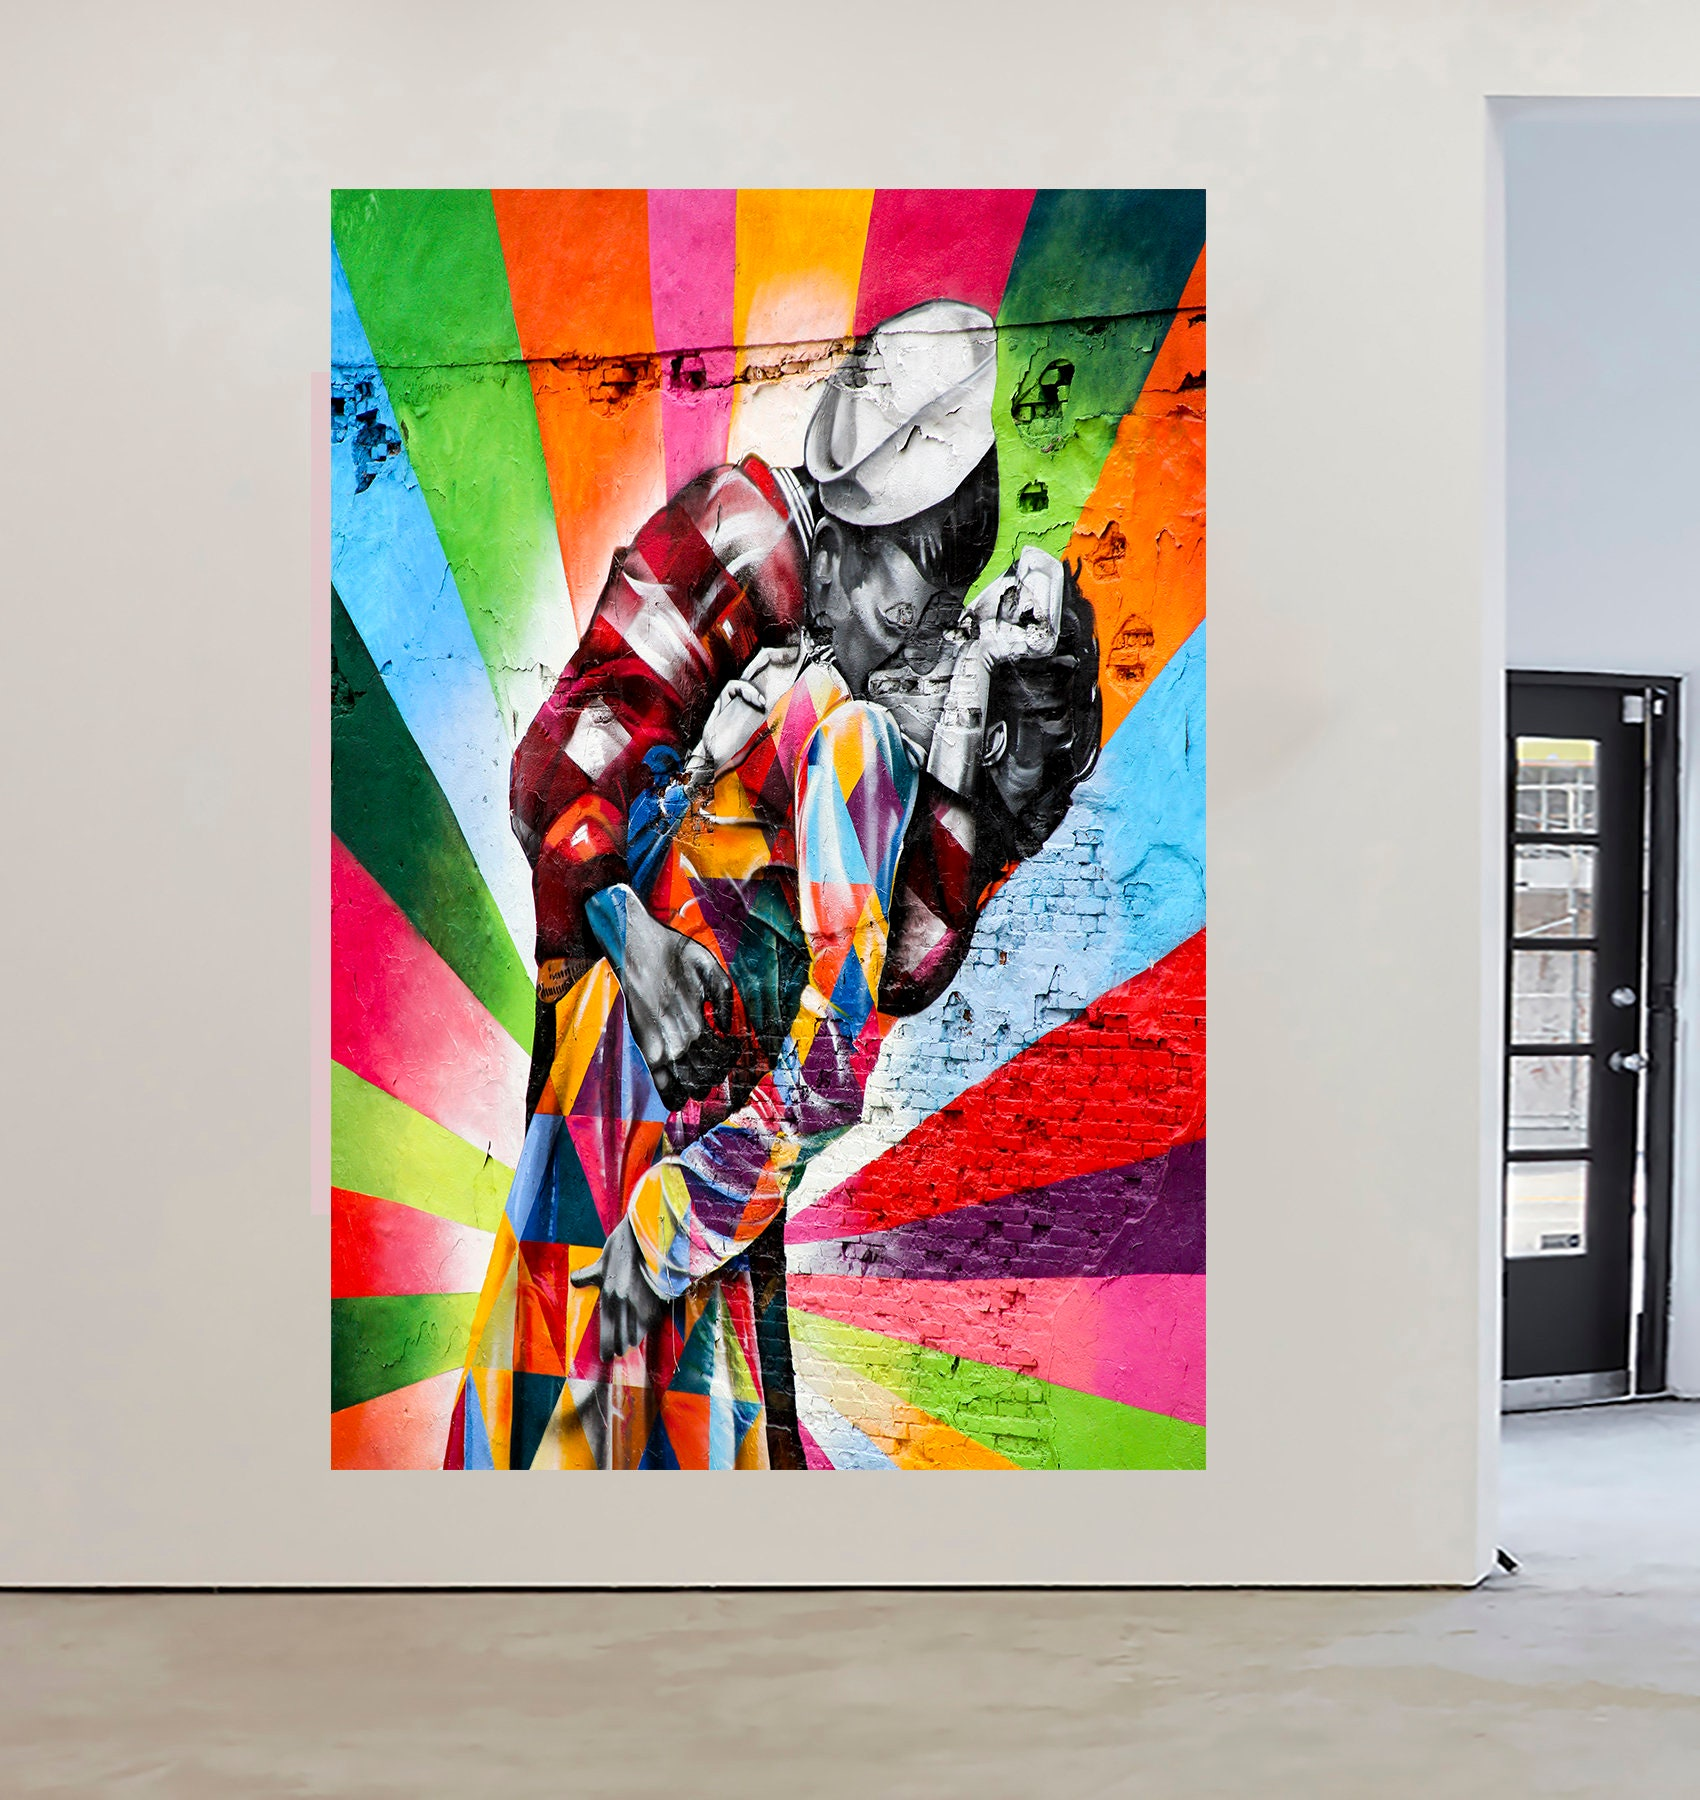 GRAFFITI  NEW YORK STREET ART URBAN 150cm x 100cm  CANVAS PRINT